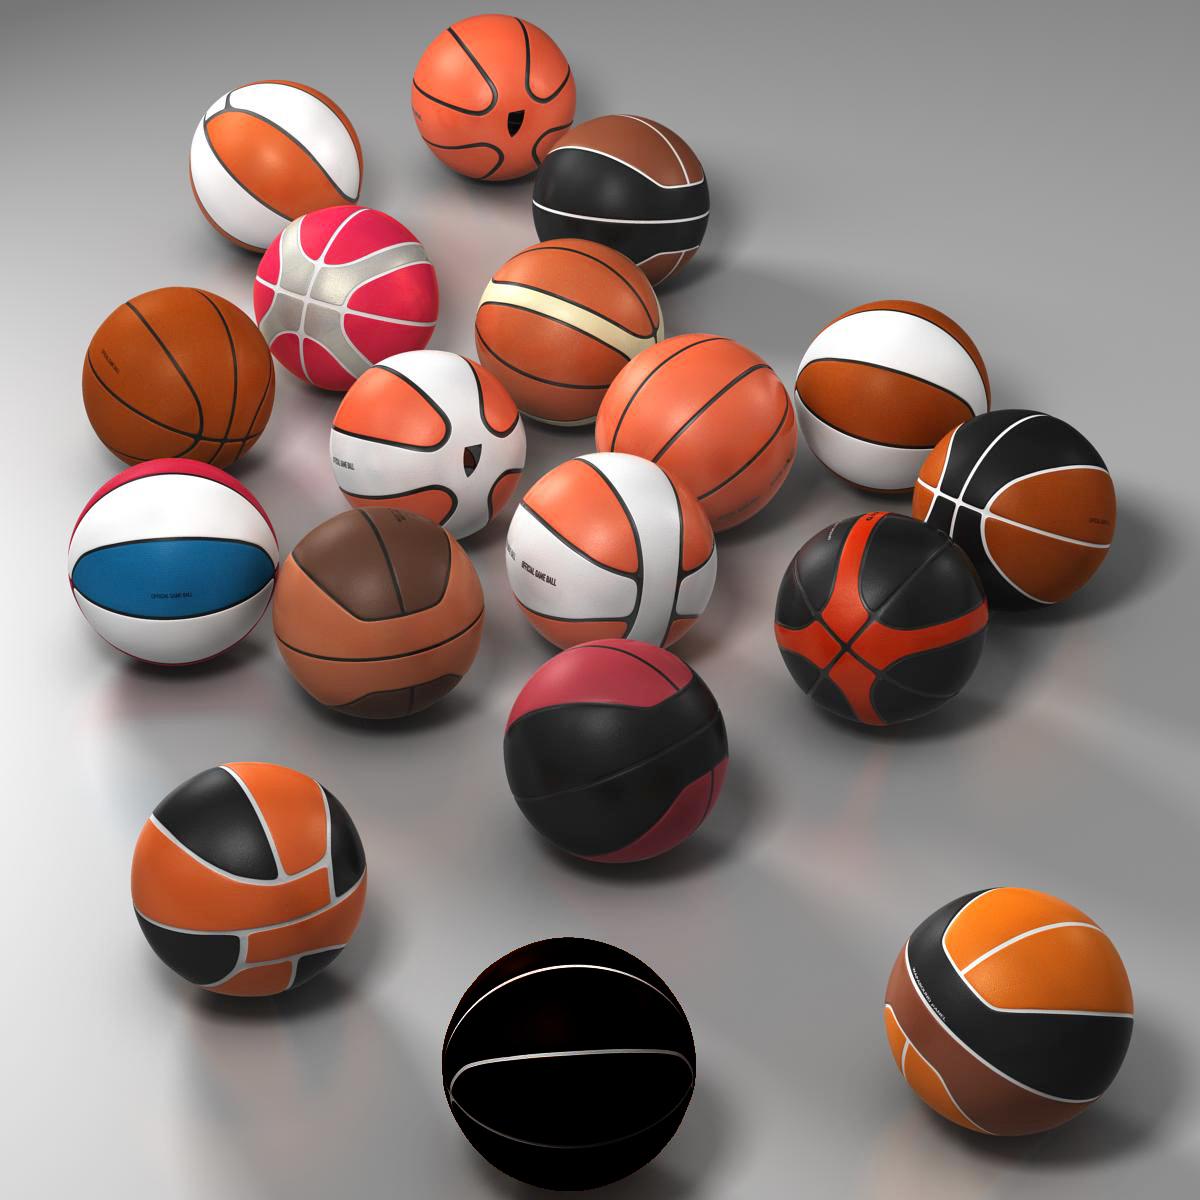 basketbola bumbu komplekts 3d modelis 3ds max fbx c4d ma mb obj 165936